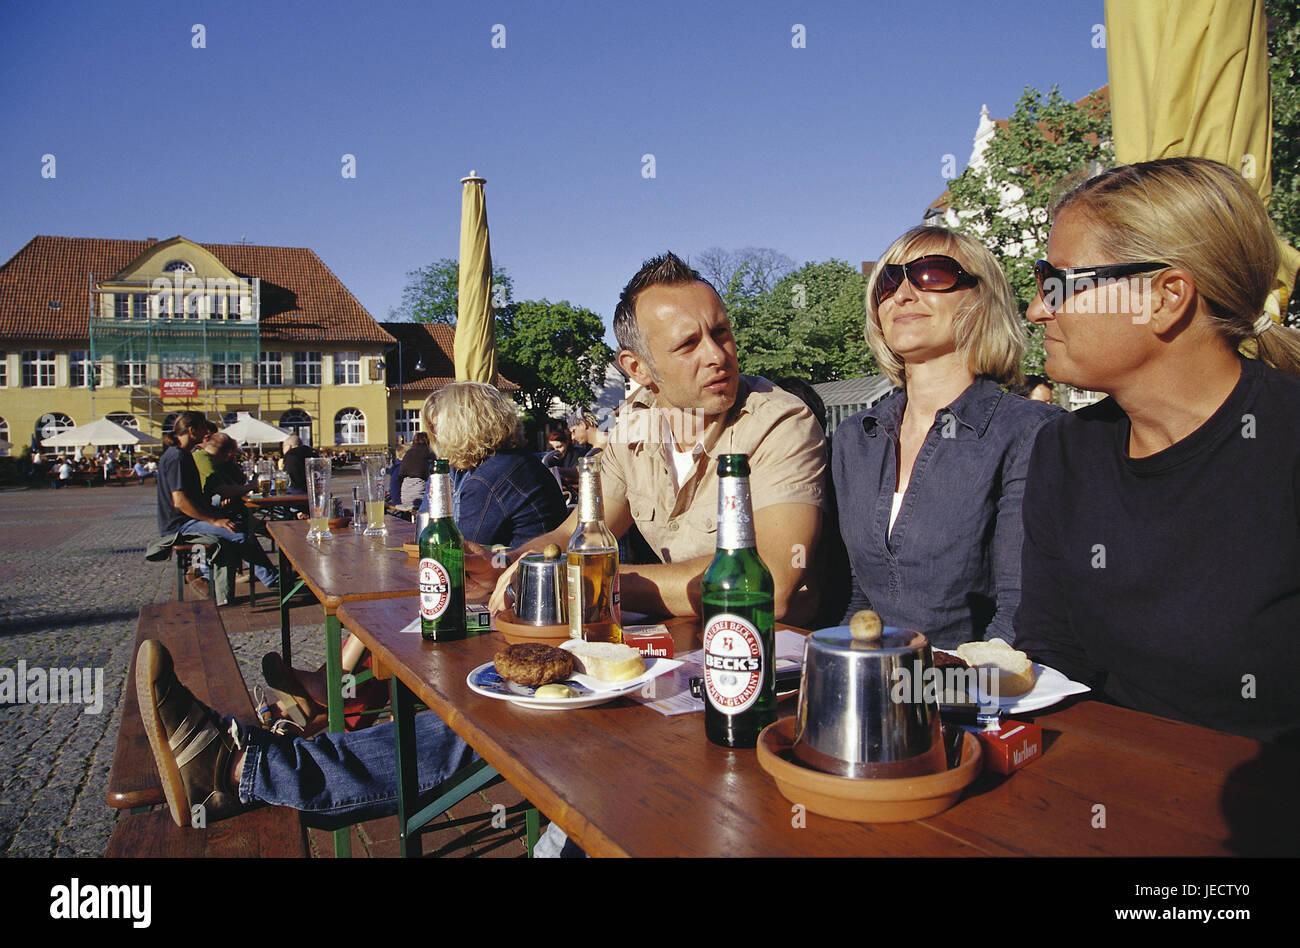 Germany, North Rhine-Westphalia, Bielefeld, Siegfried's square, street bar, guests, evening light, summer, Teutoburger - Stock Image